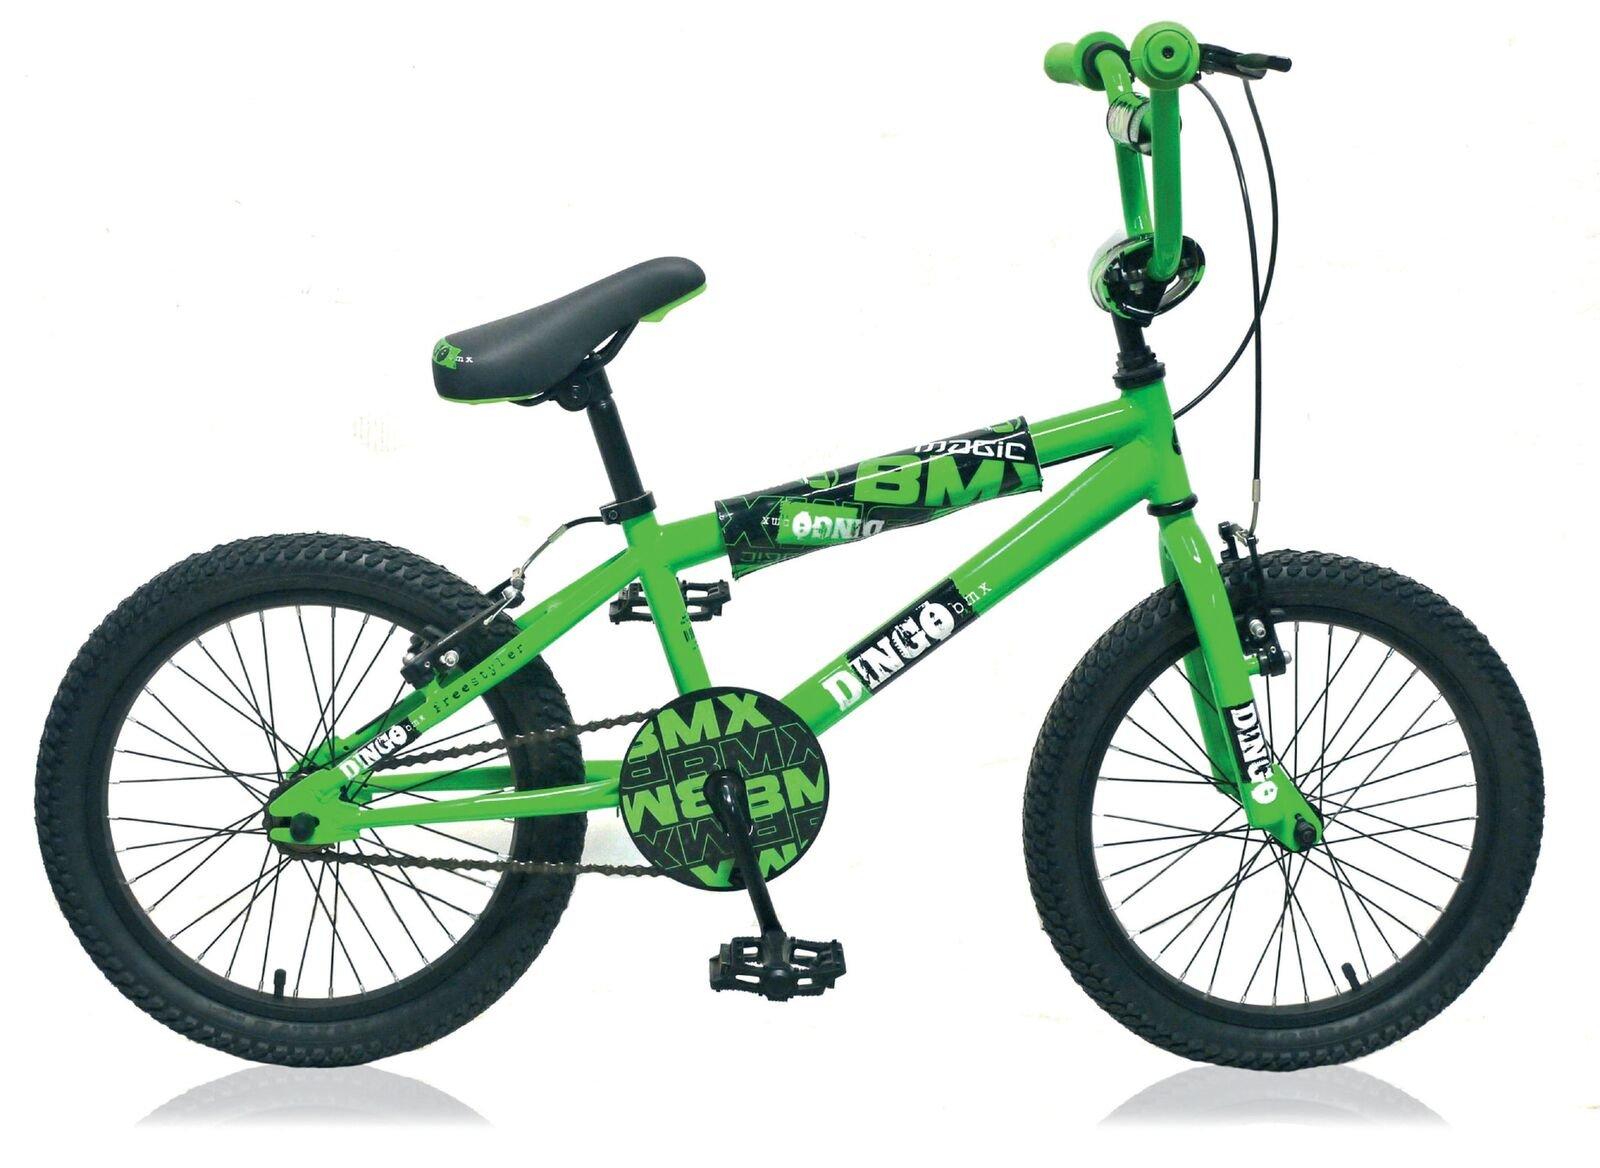 Bicicleta BMX infantil juvenil 20 pulgadas, bicicleta rueda ...